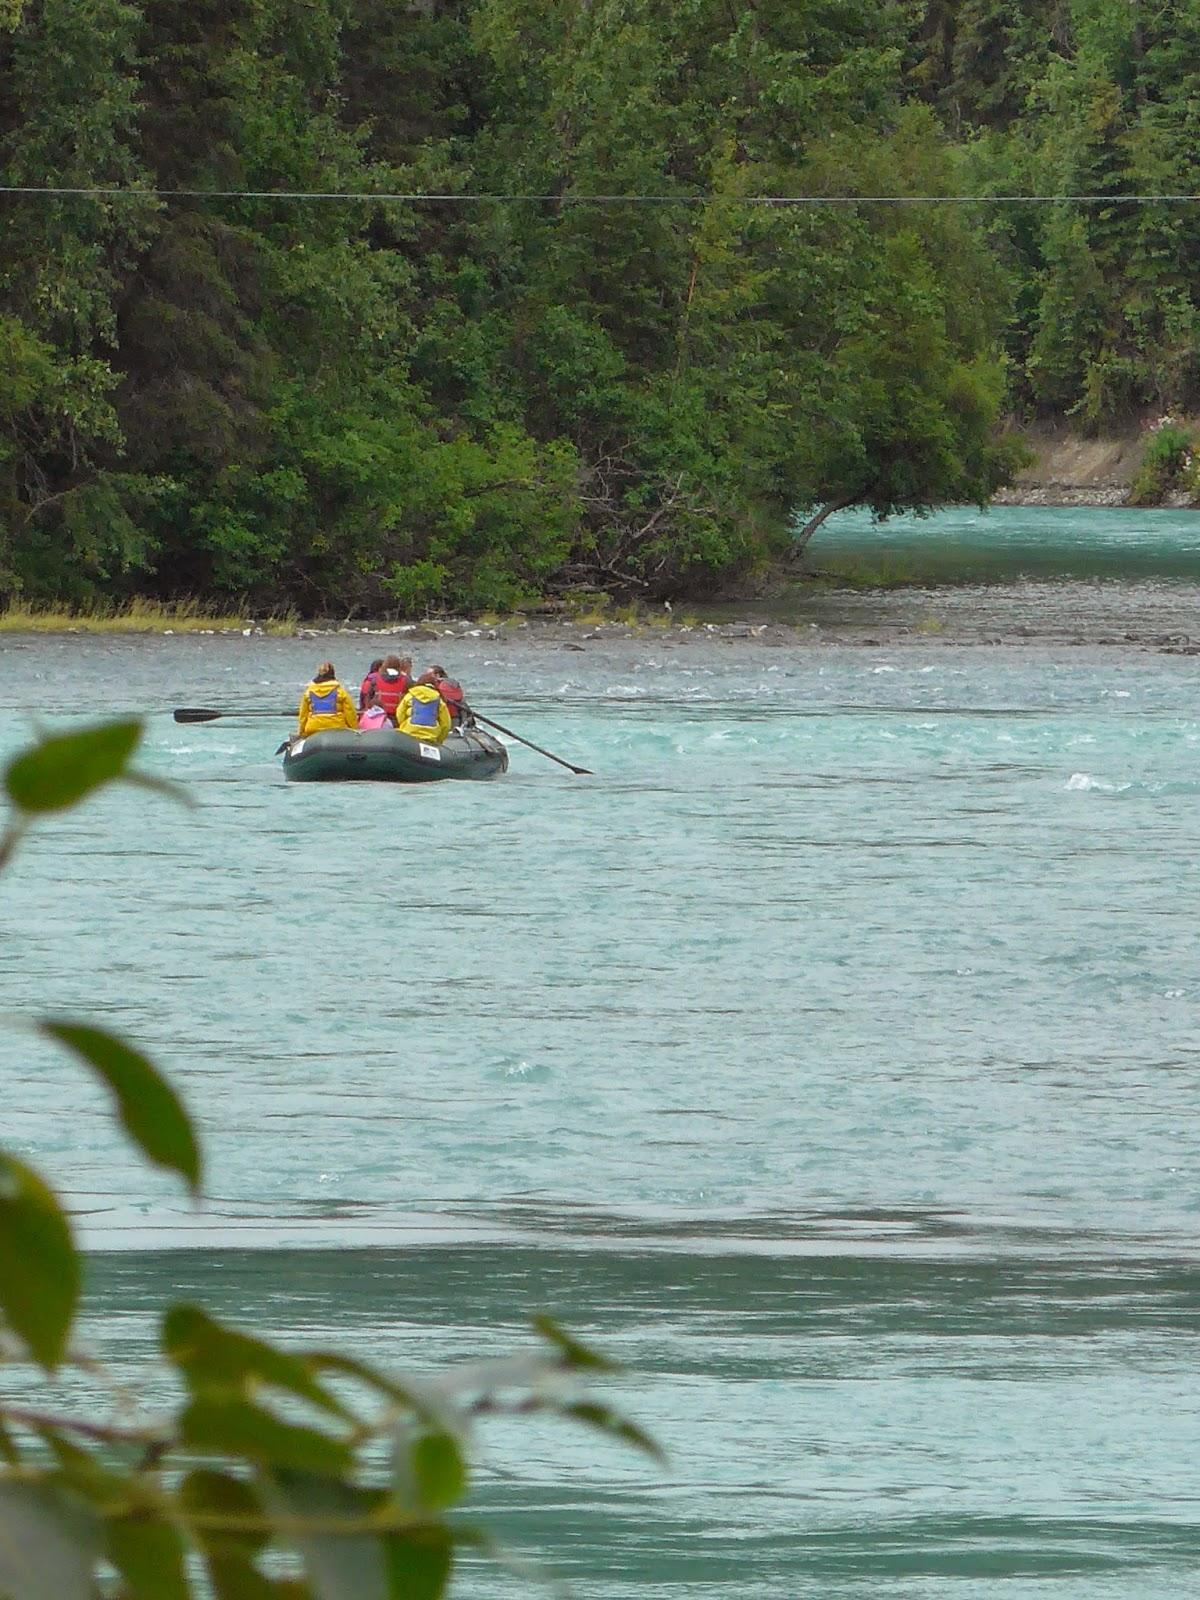 River rafting on the Upper Kenai River